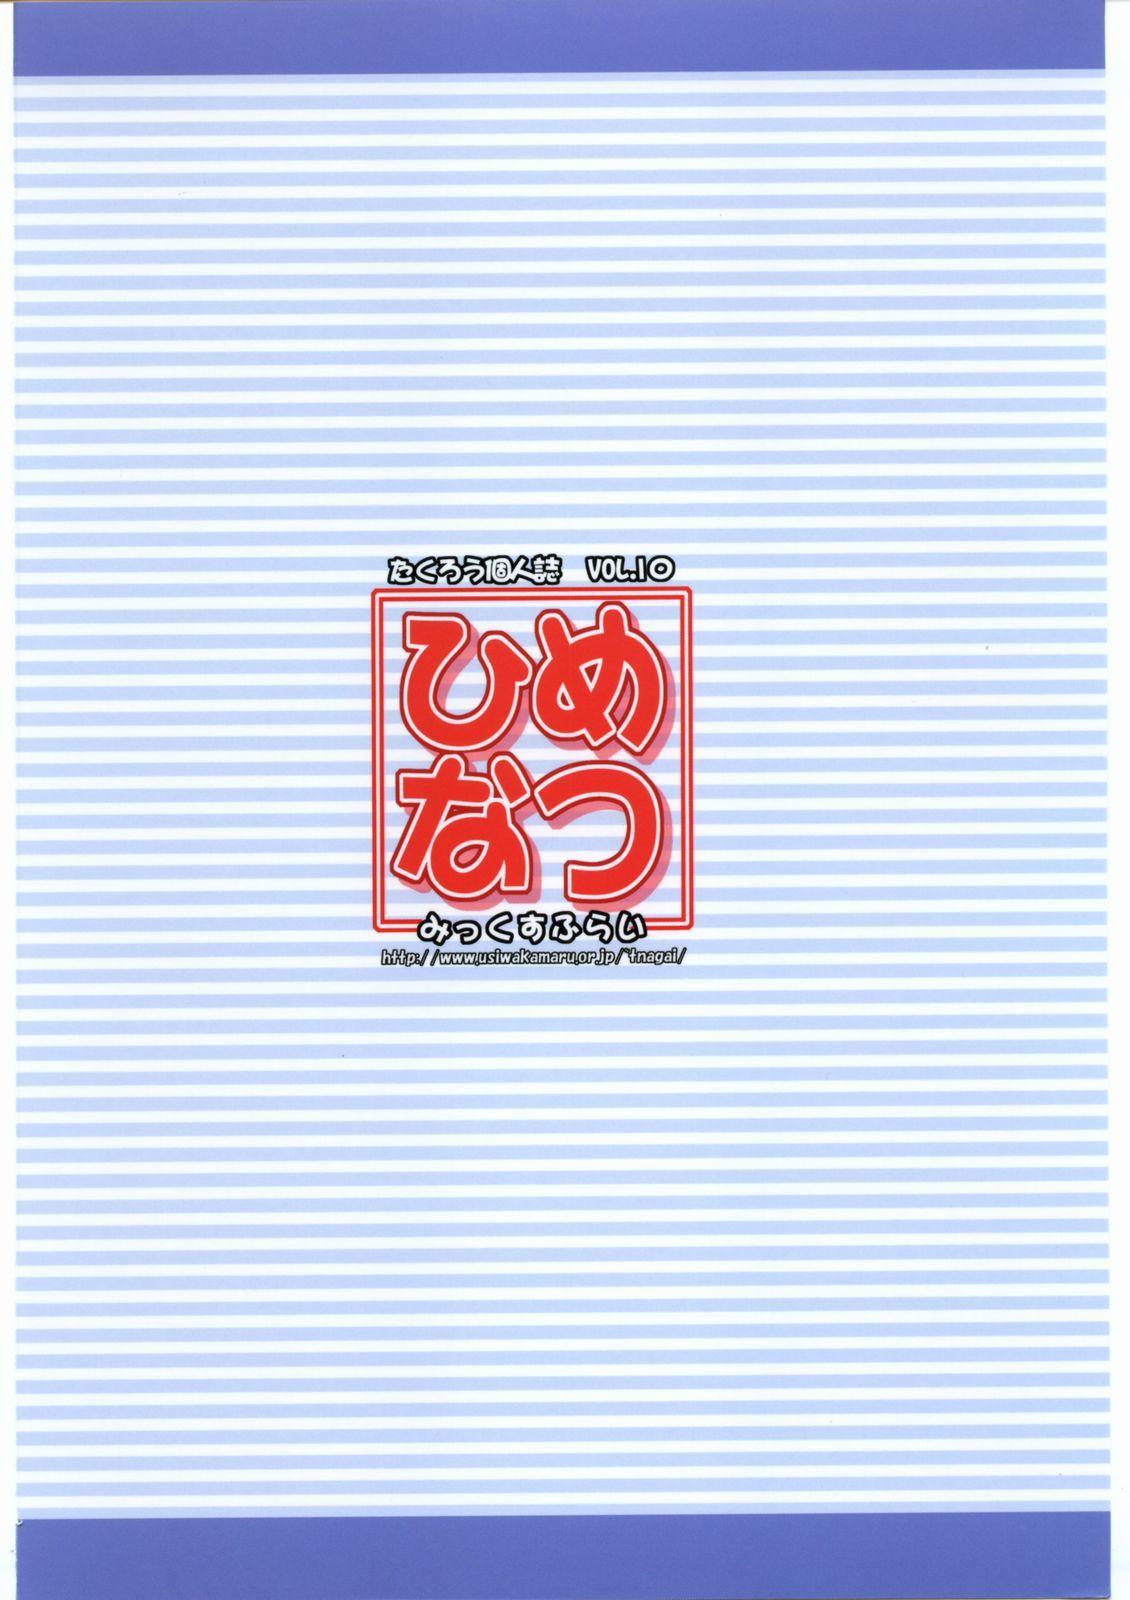 Himenatsu 17